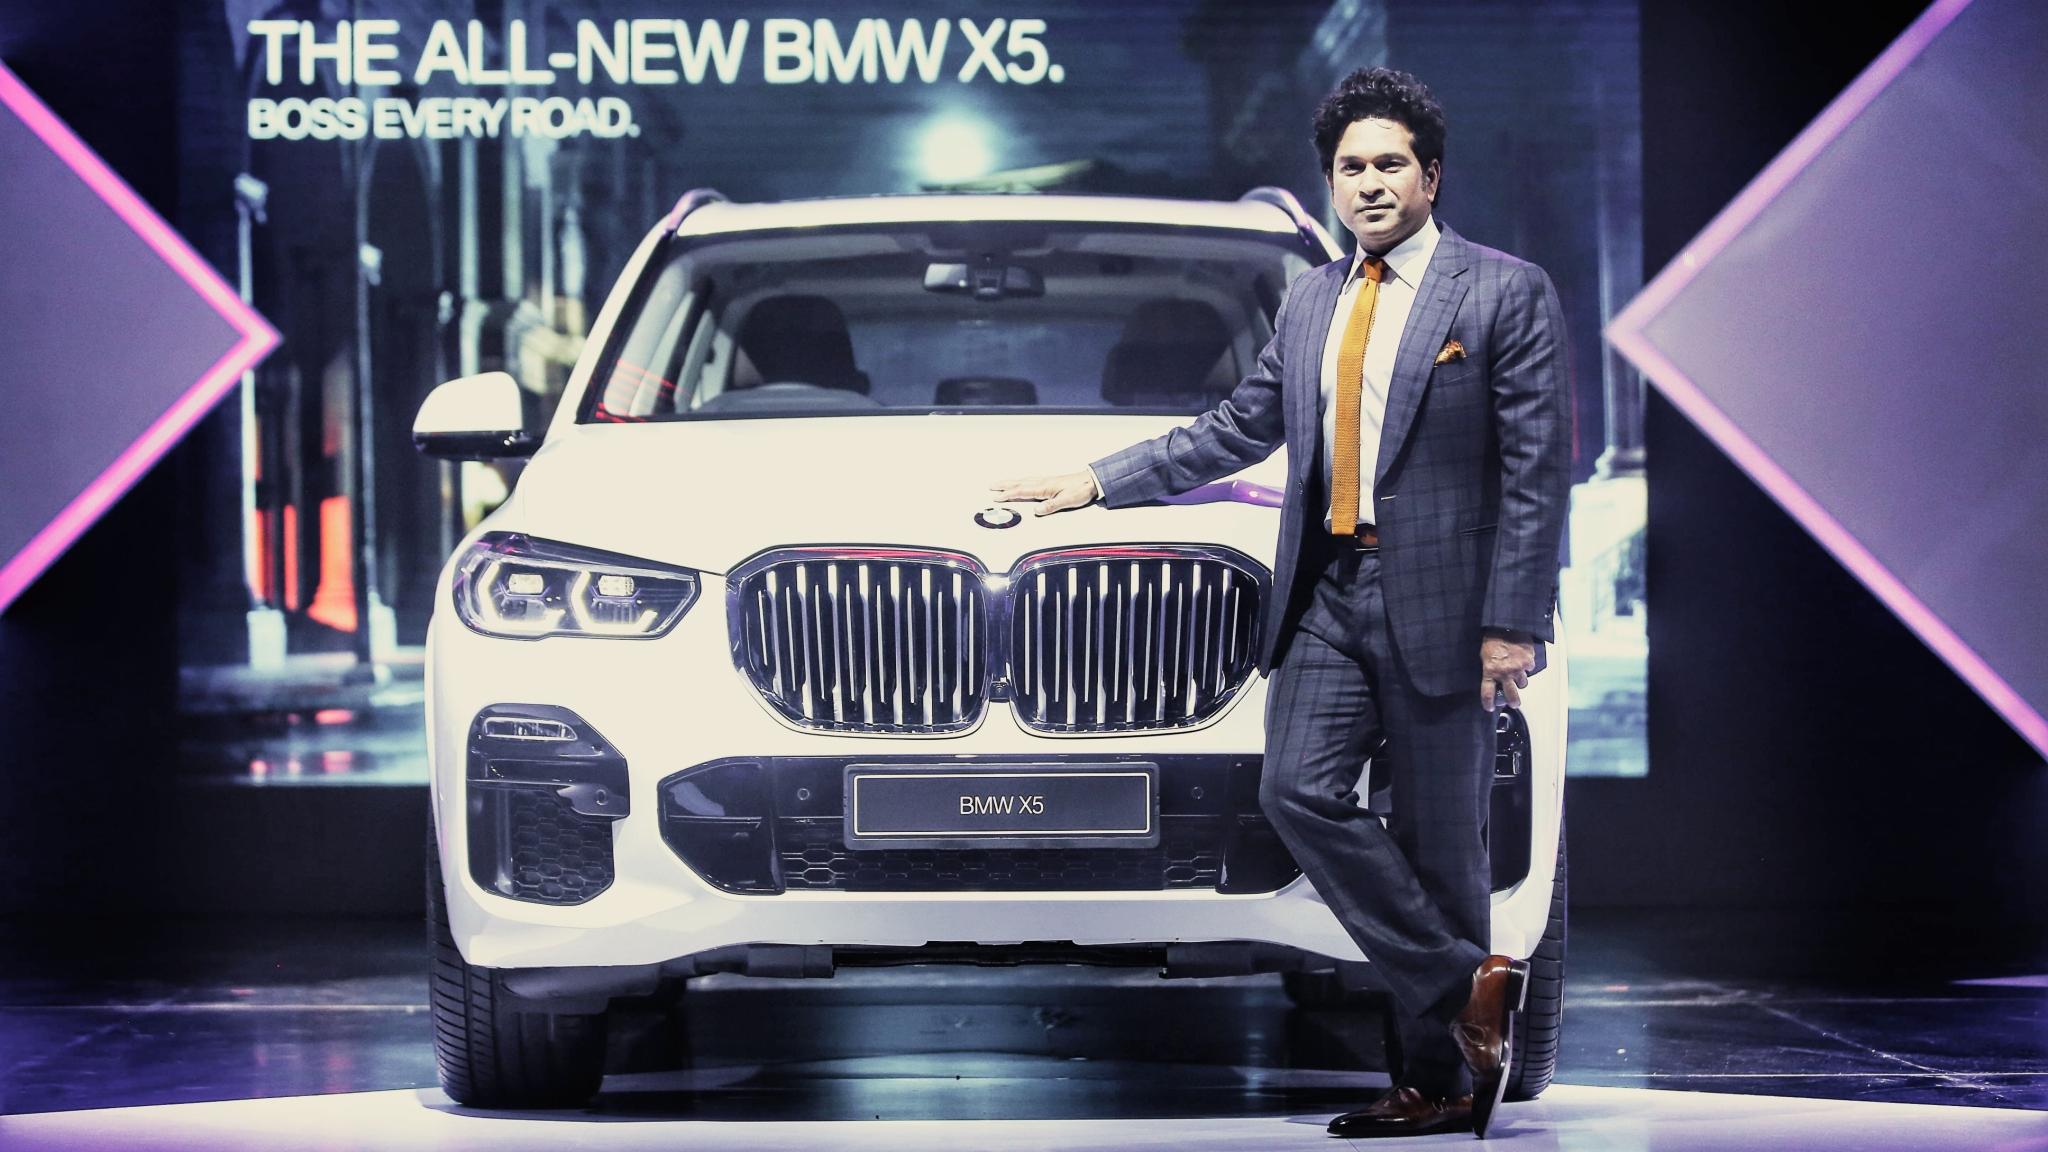 Sachin Tendulkar Launches 2019 BMW X5, Prices Start at Rs 73 Lakh